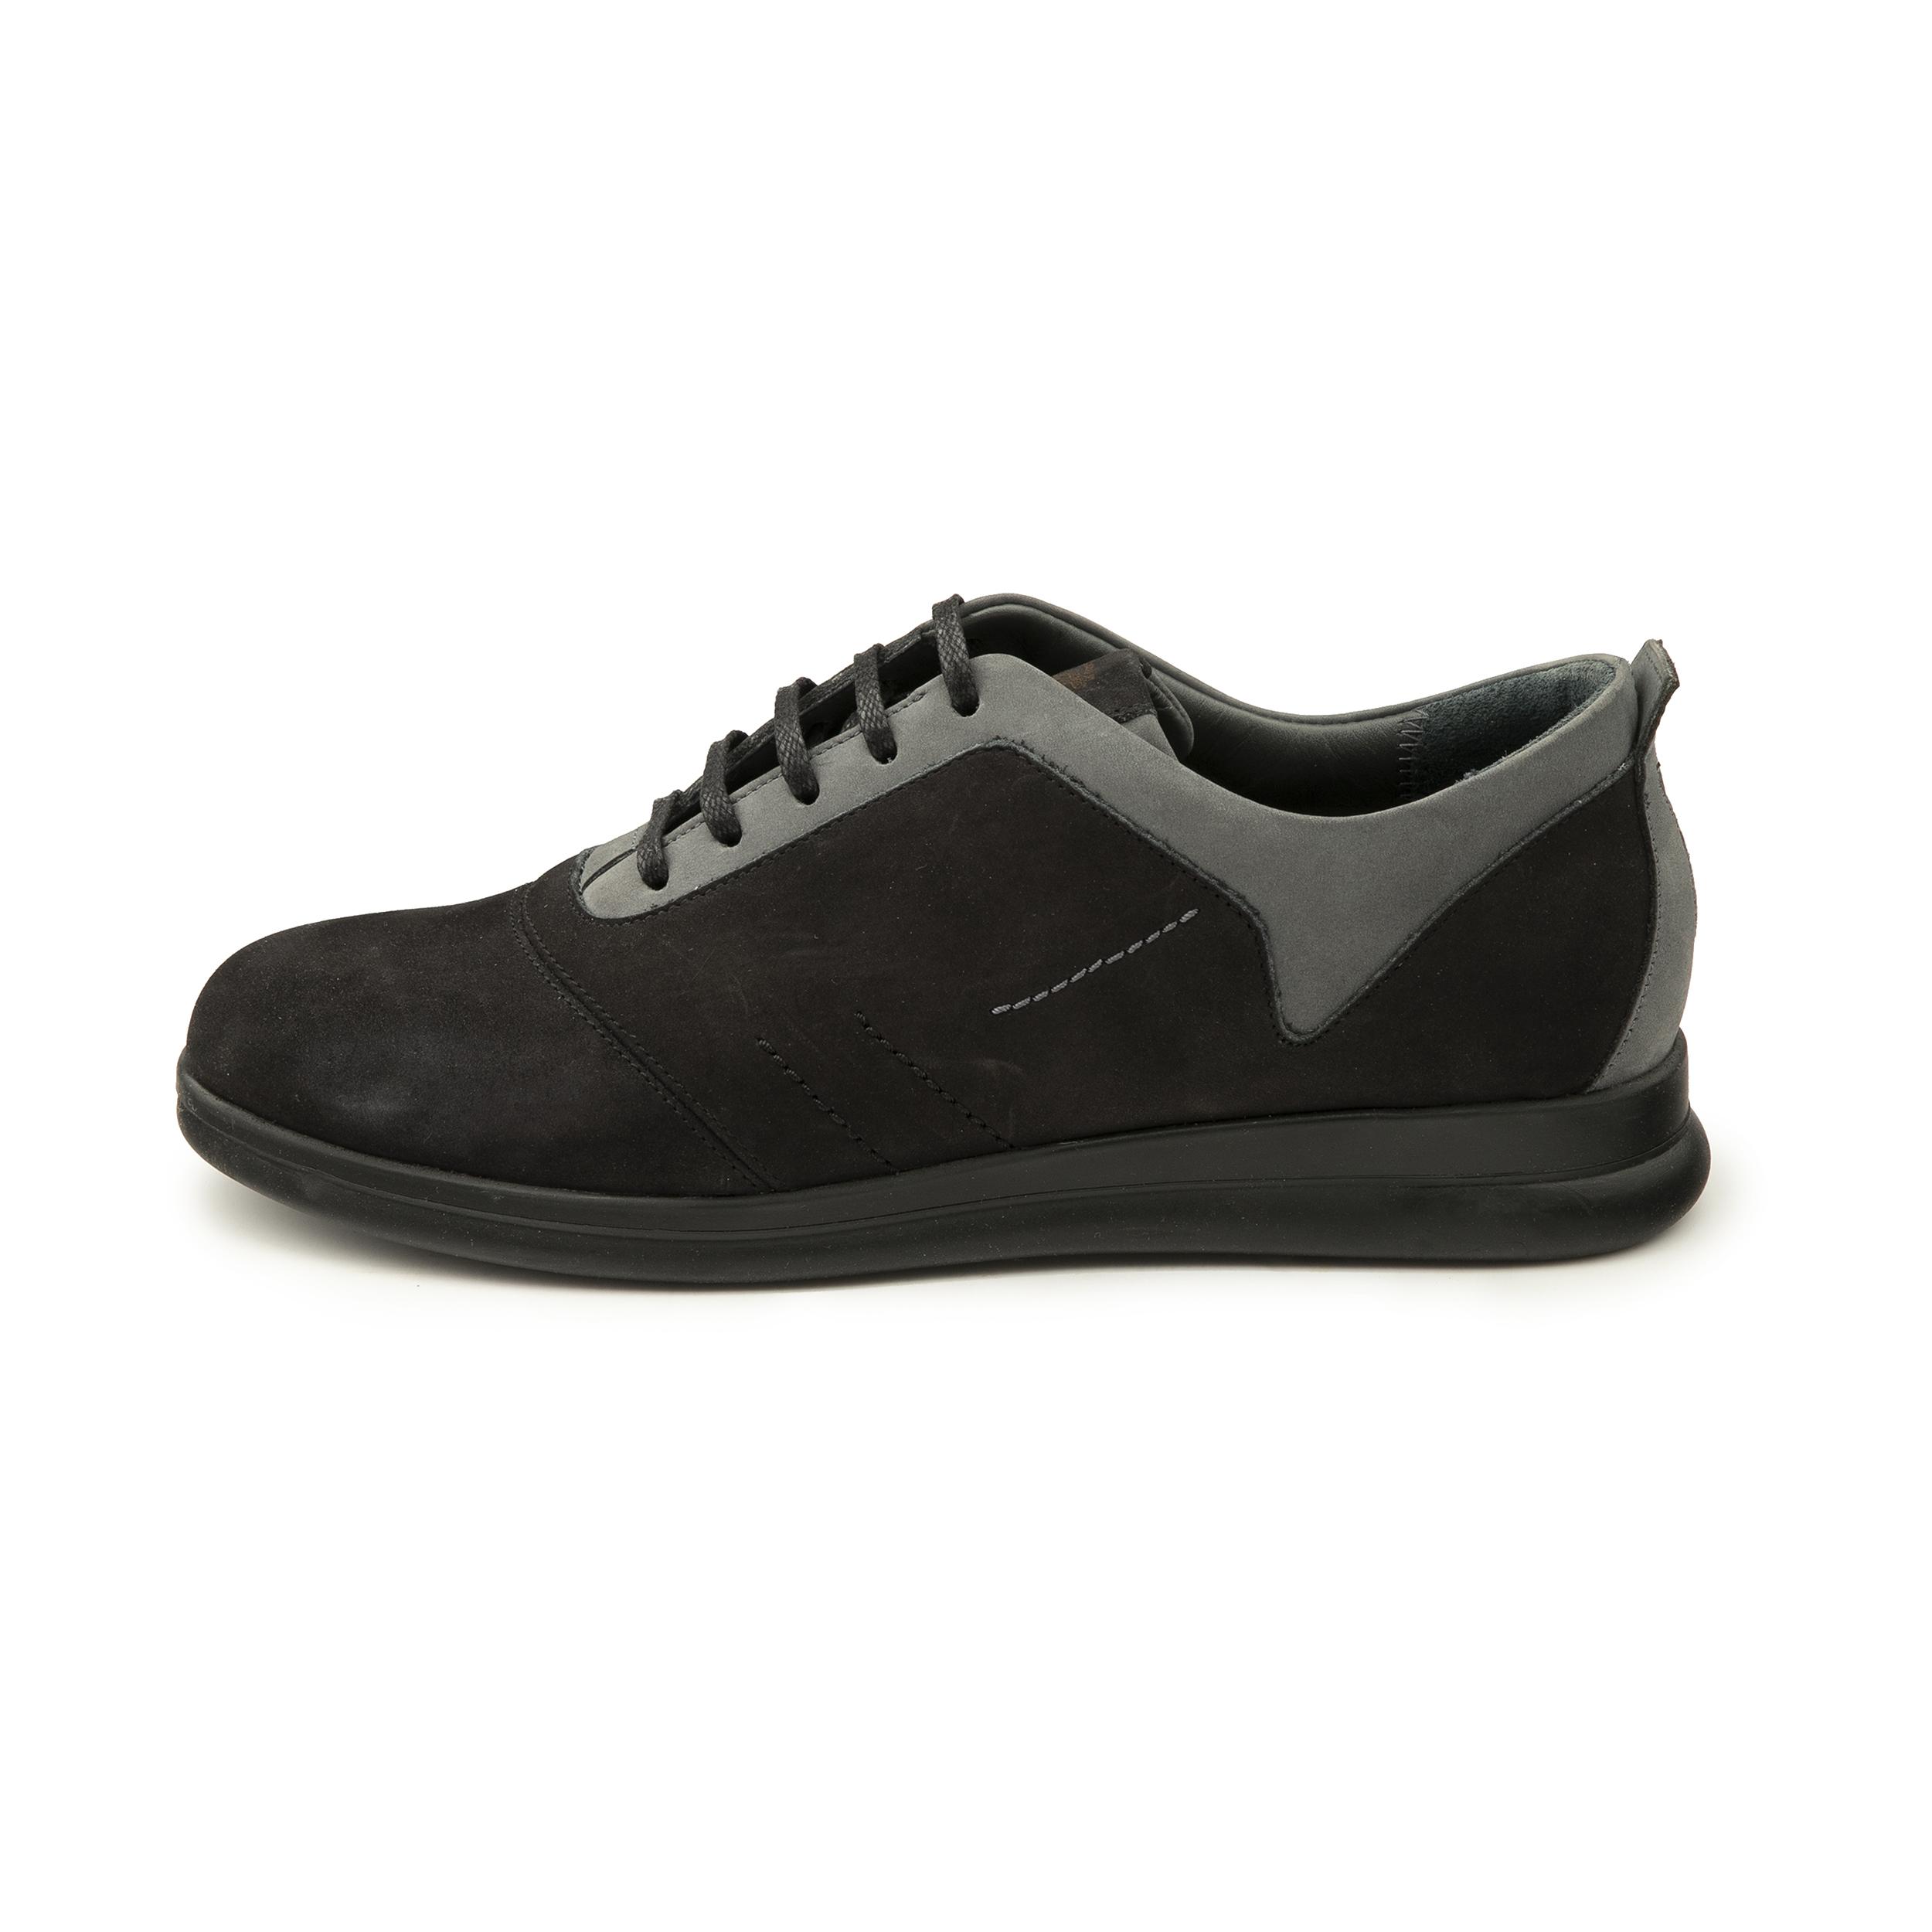 کفش روزمره زنانه برتونیکس مدل 602 B027